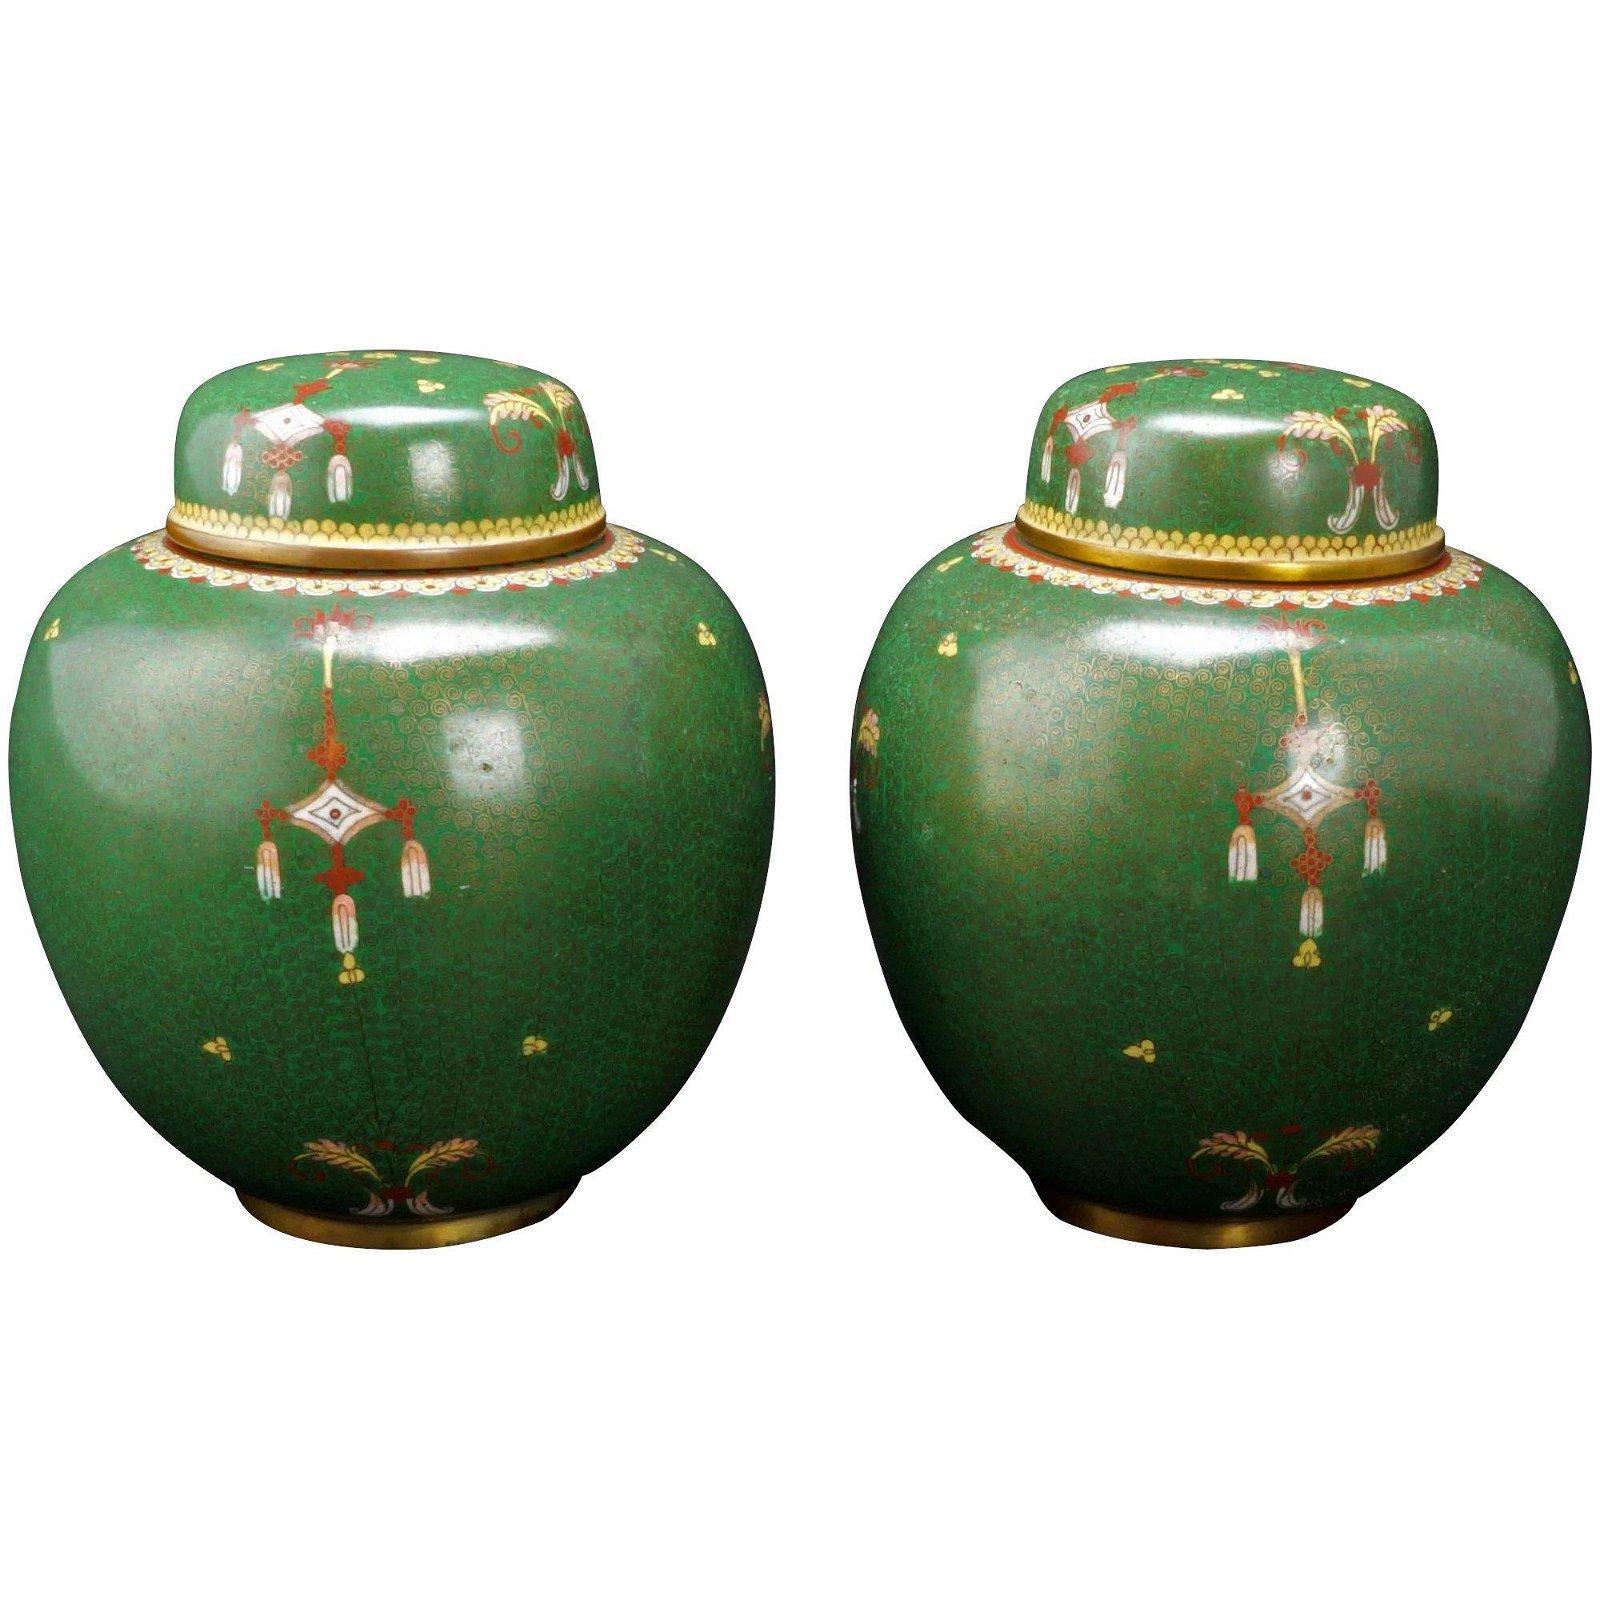 Pair Chinese Qing Green Cloisonné Lidded Jars